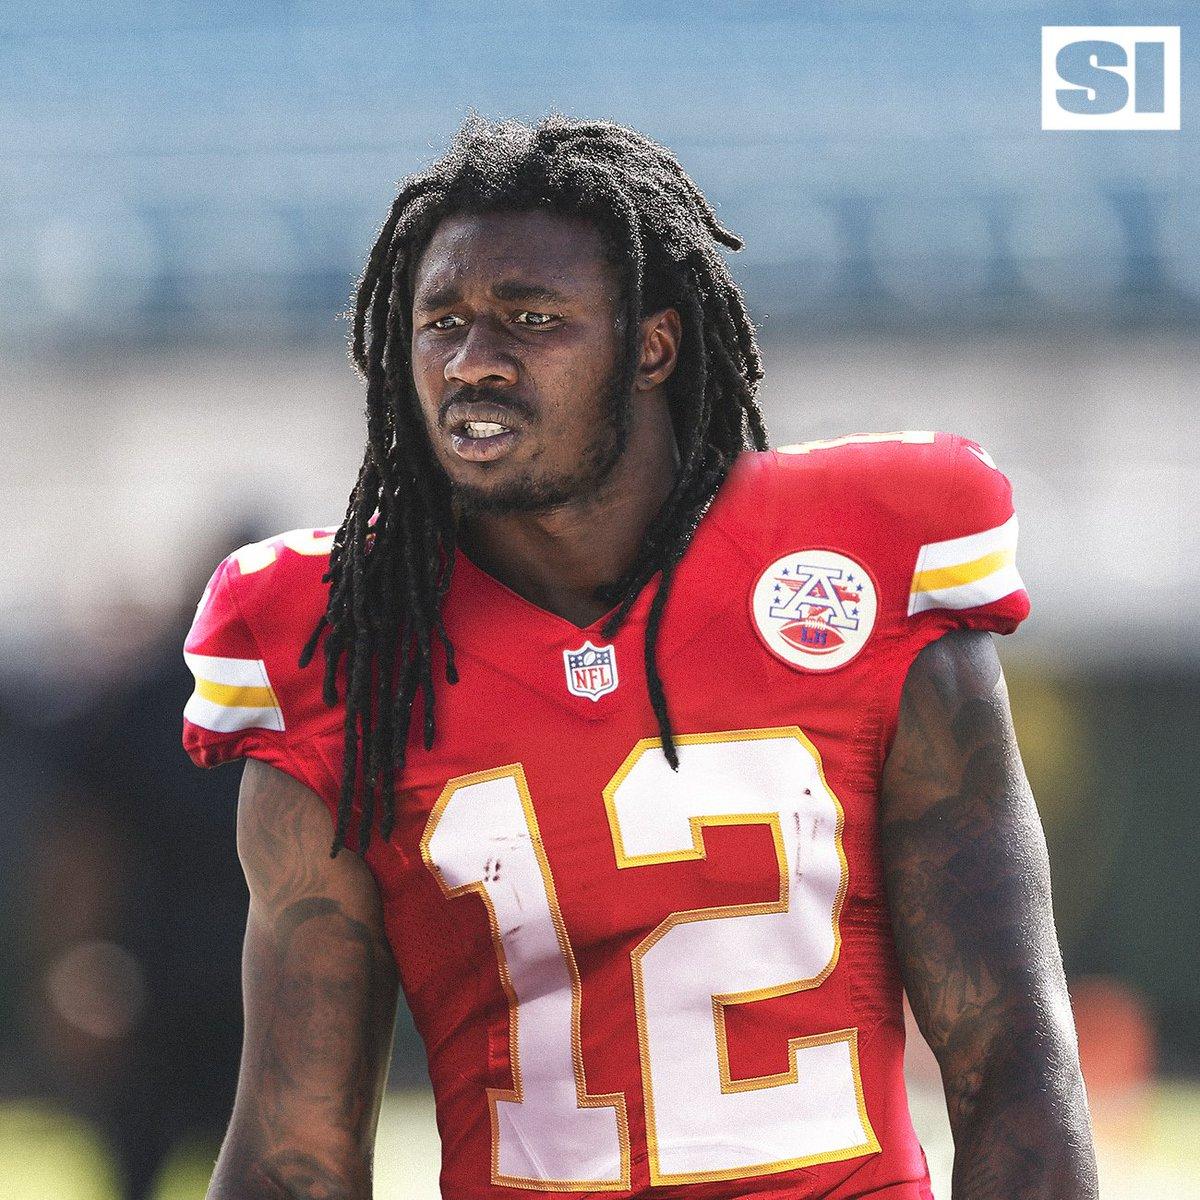 Sports Illustrated's photo on Watkins